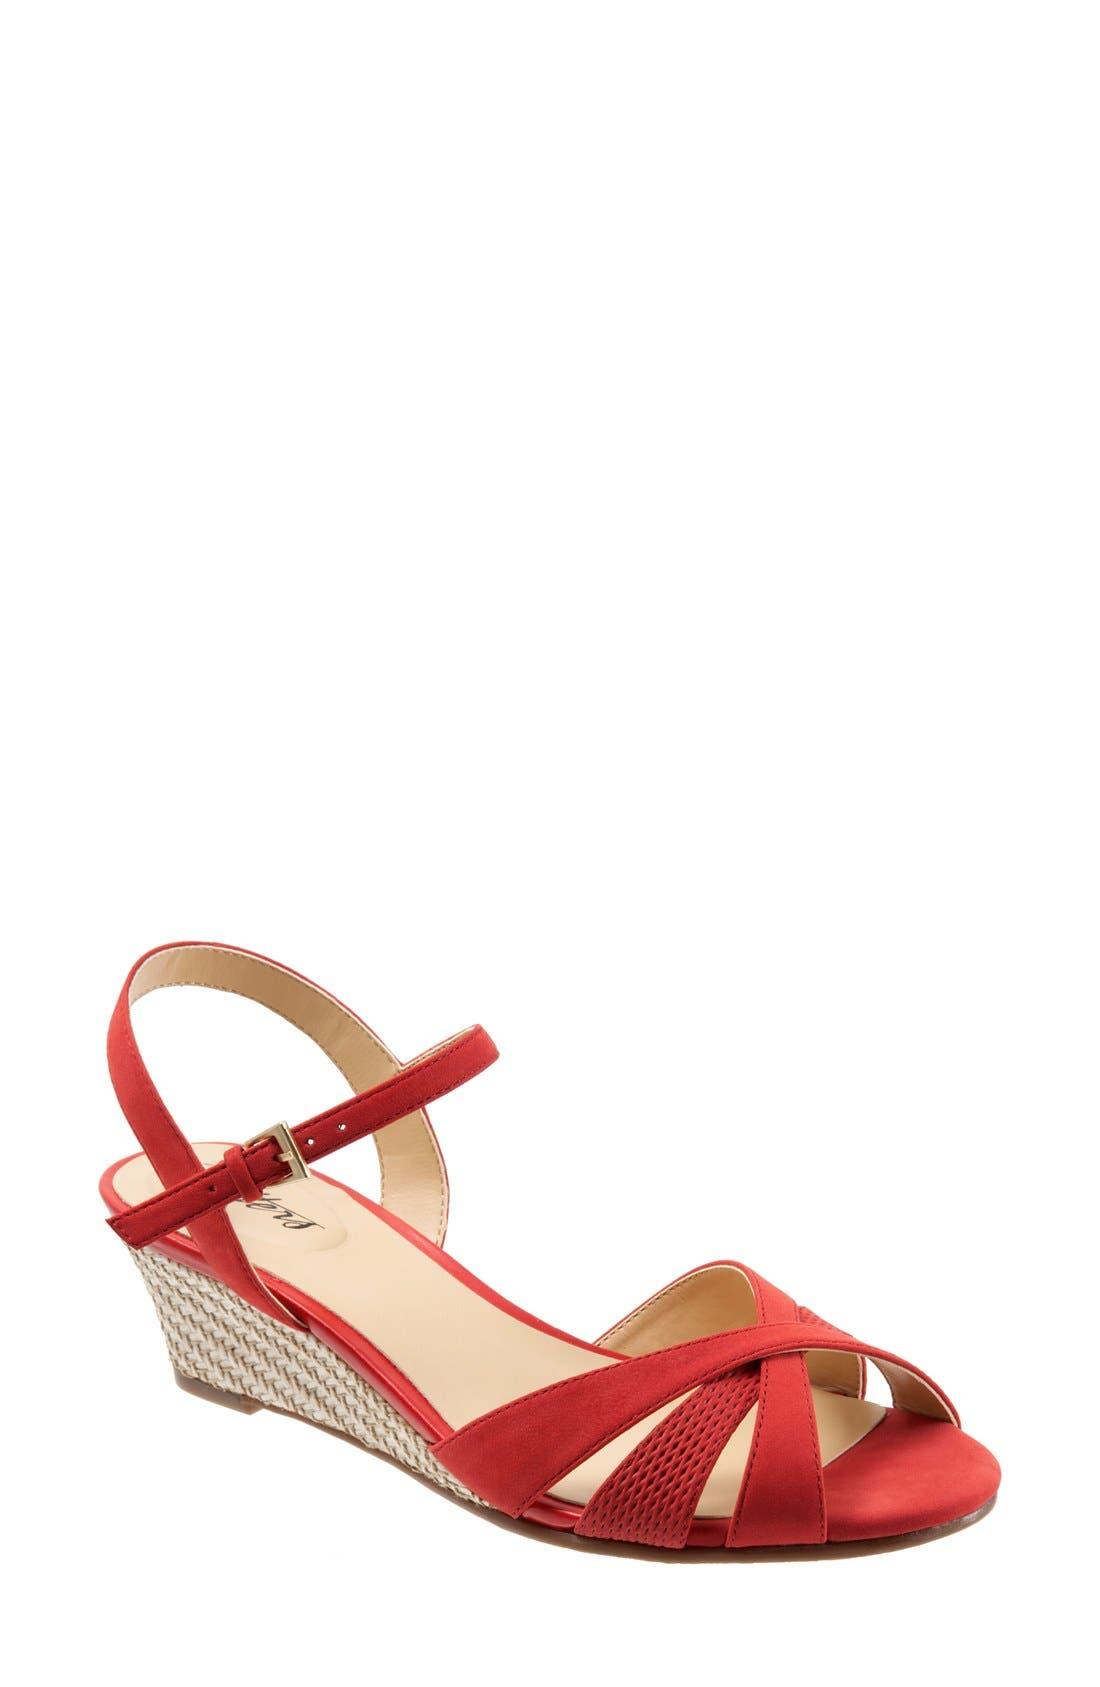 Main Image - Trotters 'Mickey' Wedge Sandal (Women)